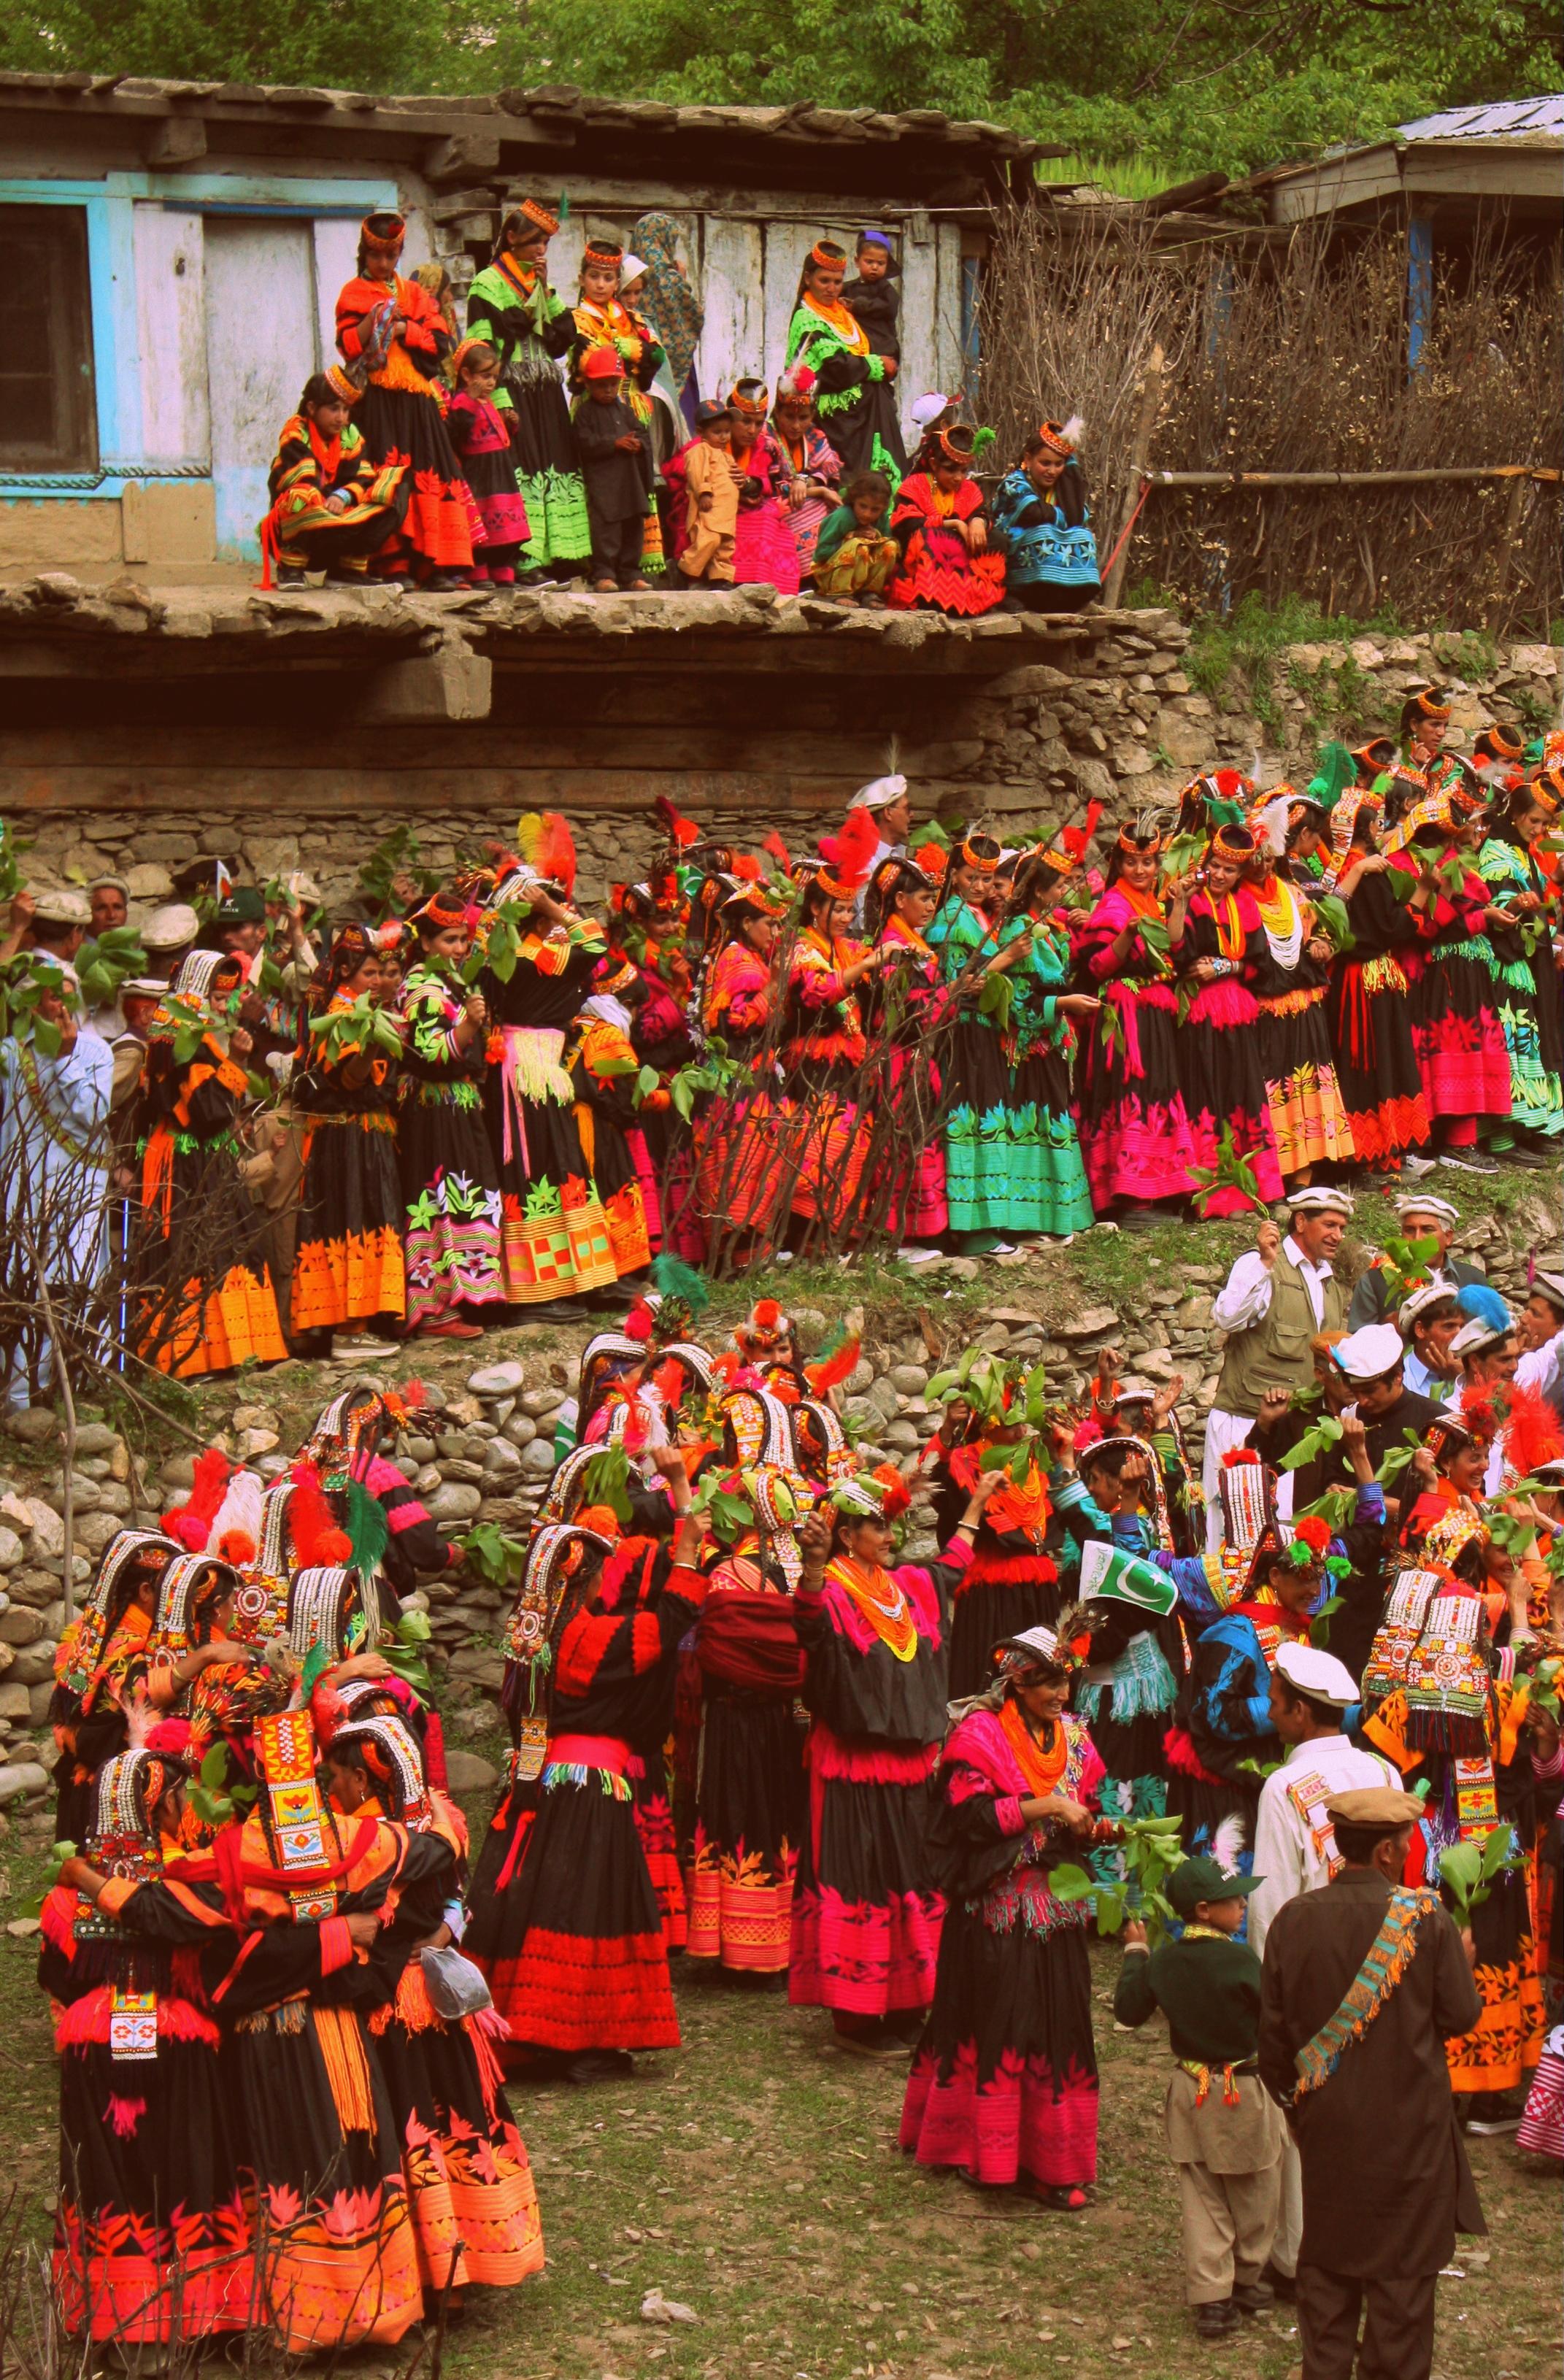 Kalash People during the Chillam Joshi Festiva. Pic Courtesy Wikipedia